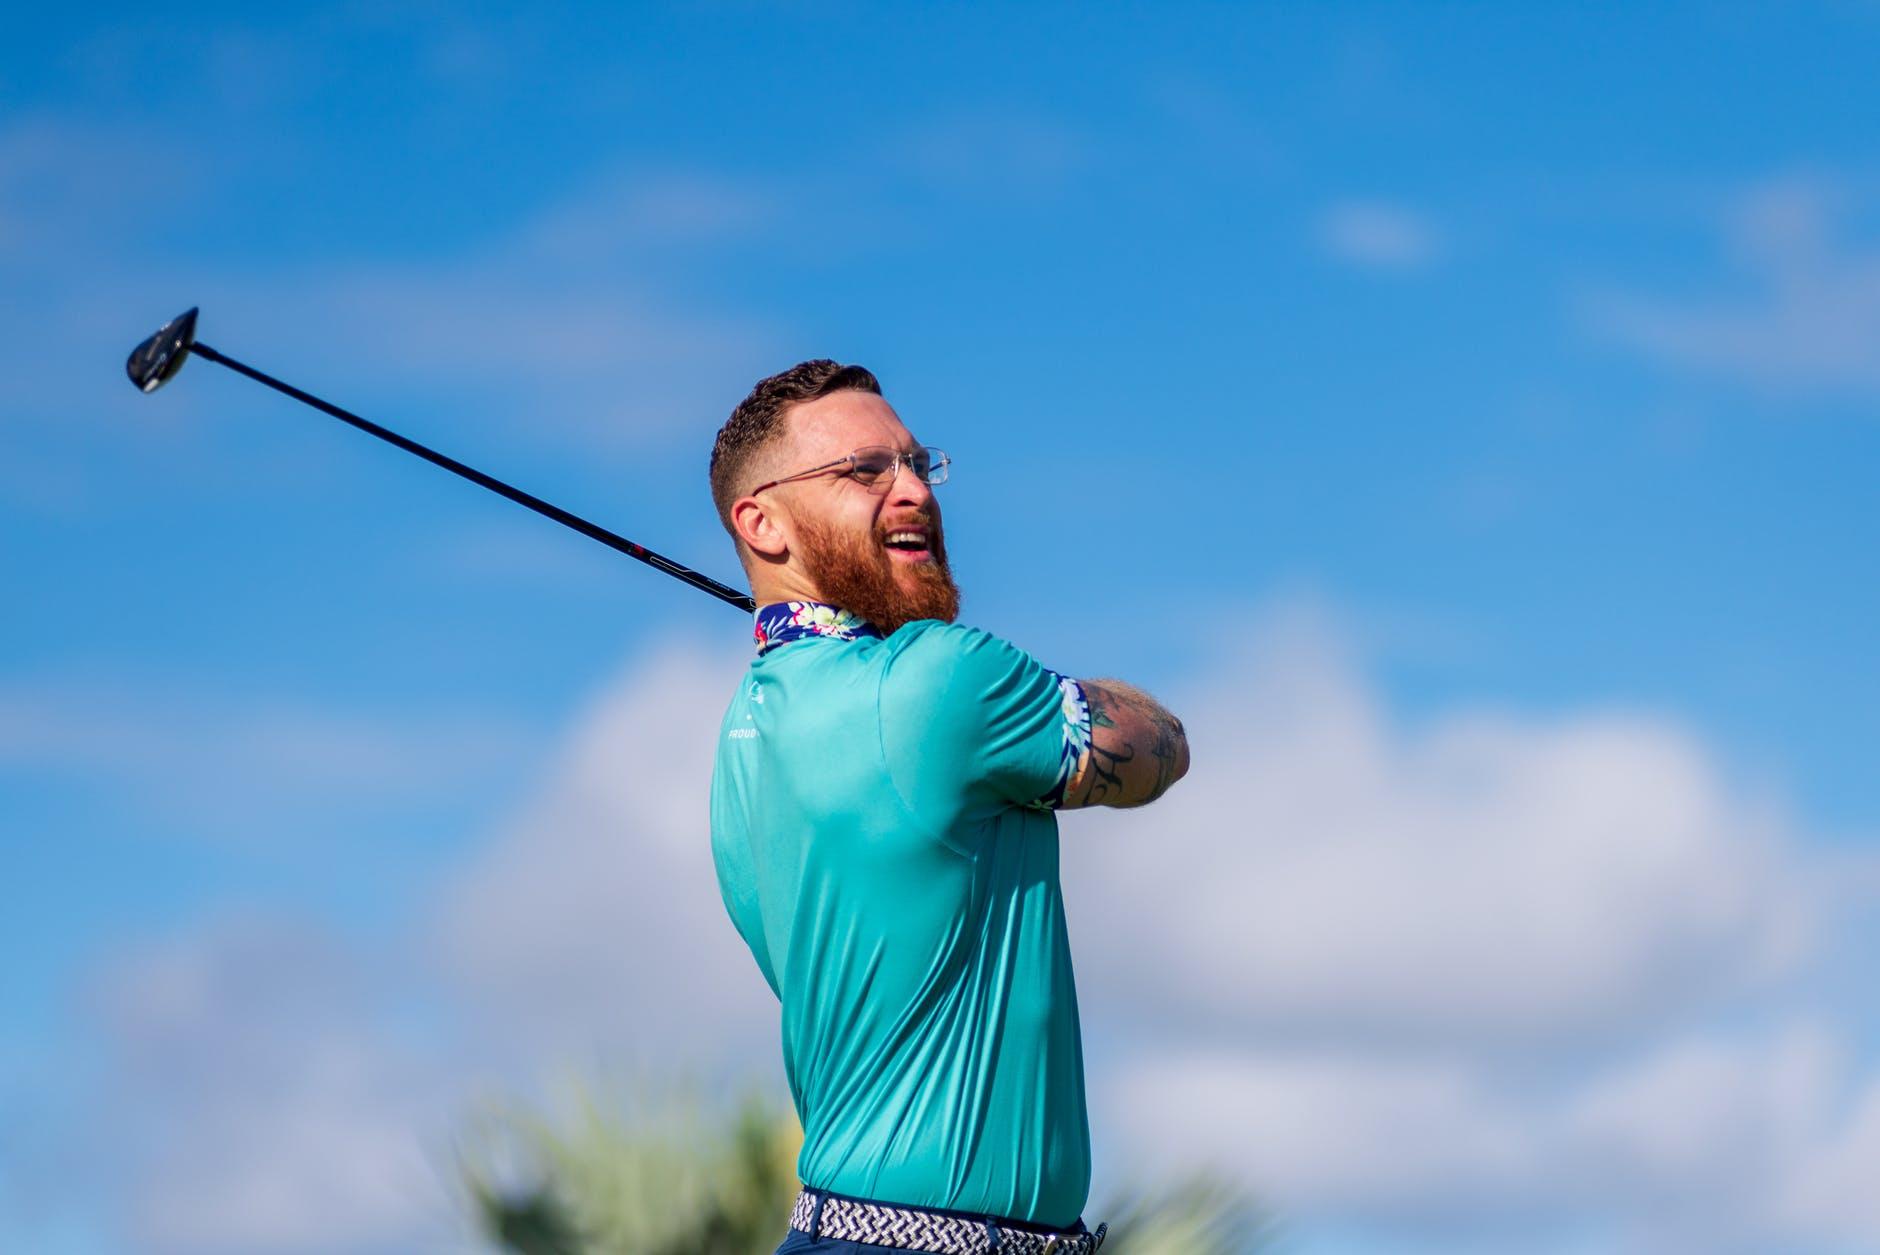 photo of man playing golf